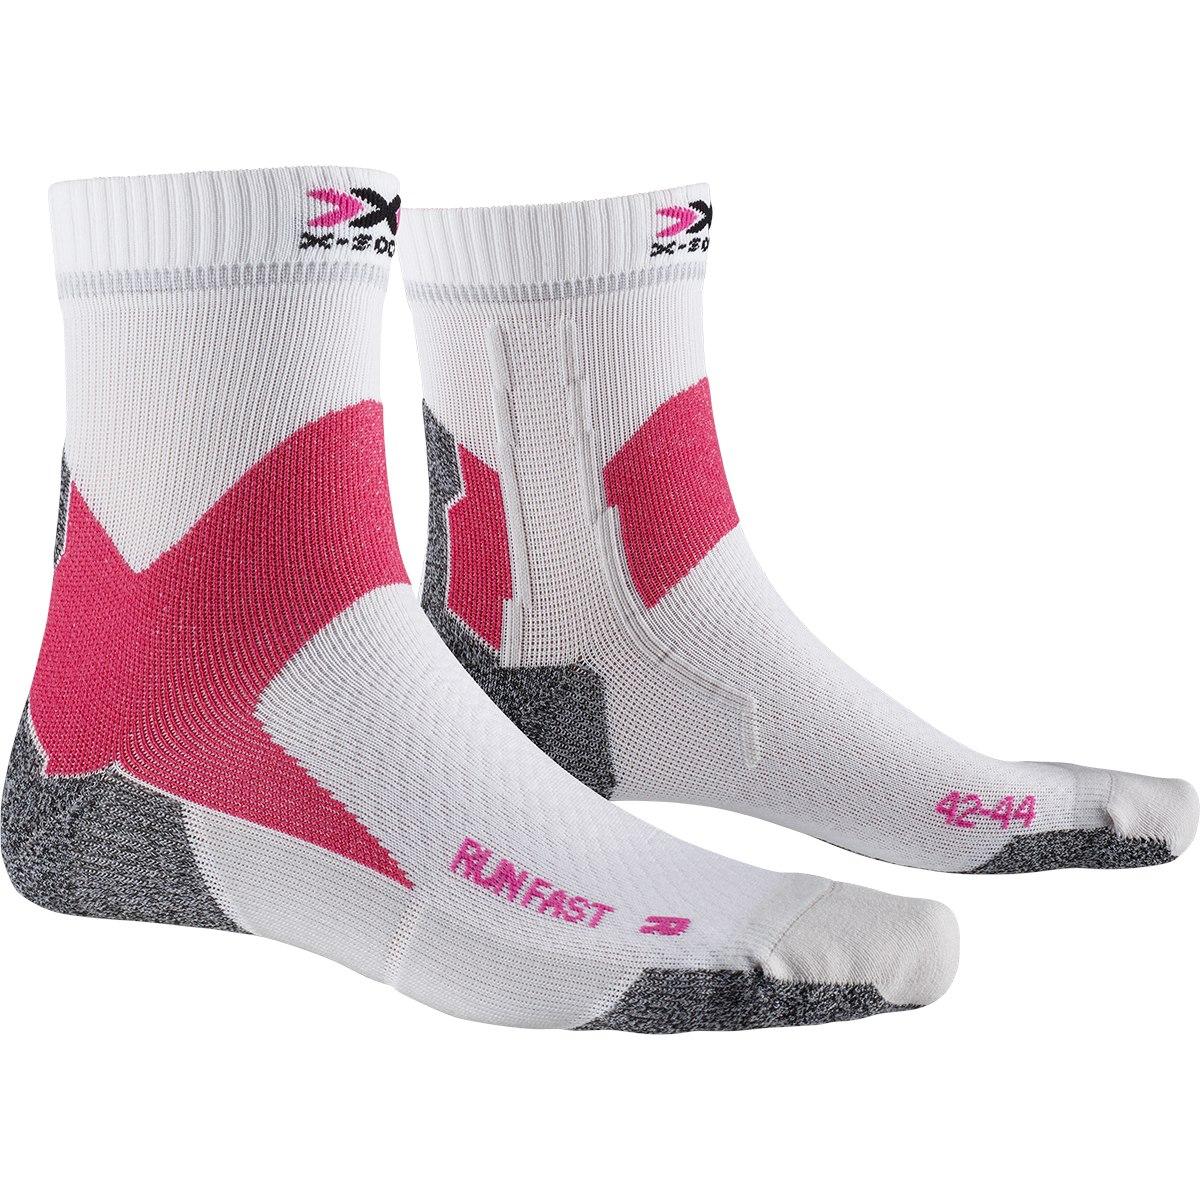 X-Socks Run Fast Laufsocken - arctic white/flamingo pink